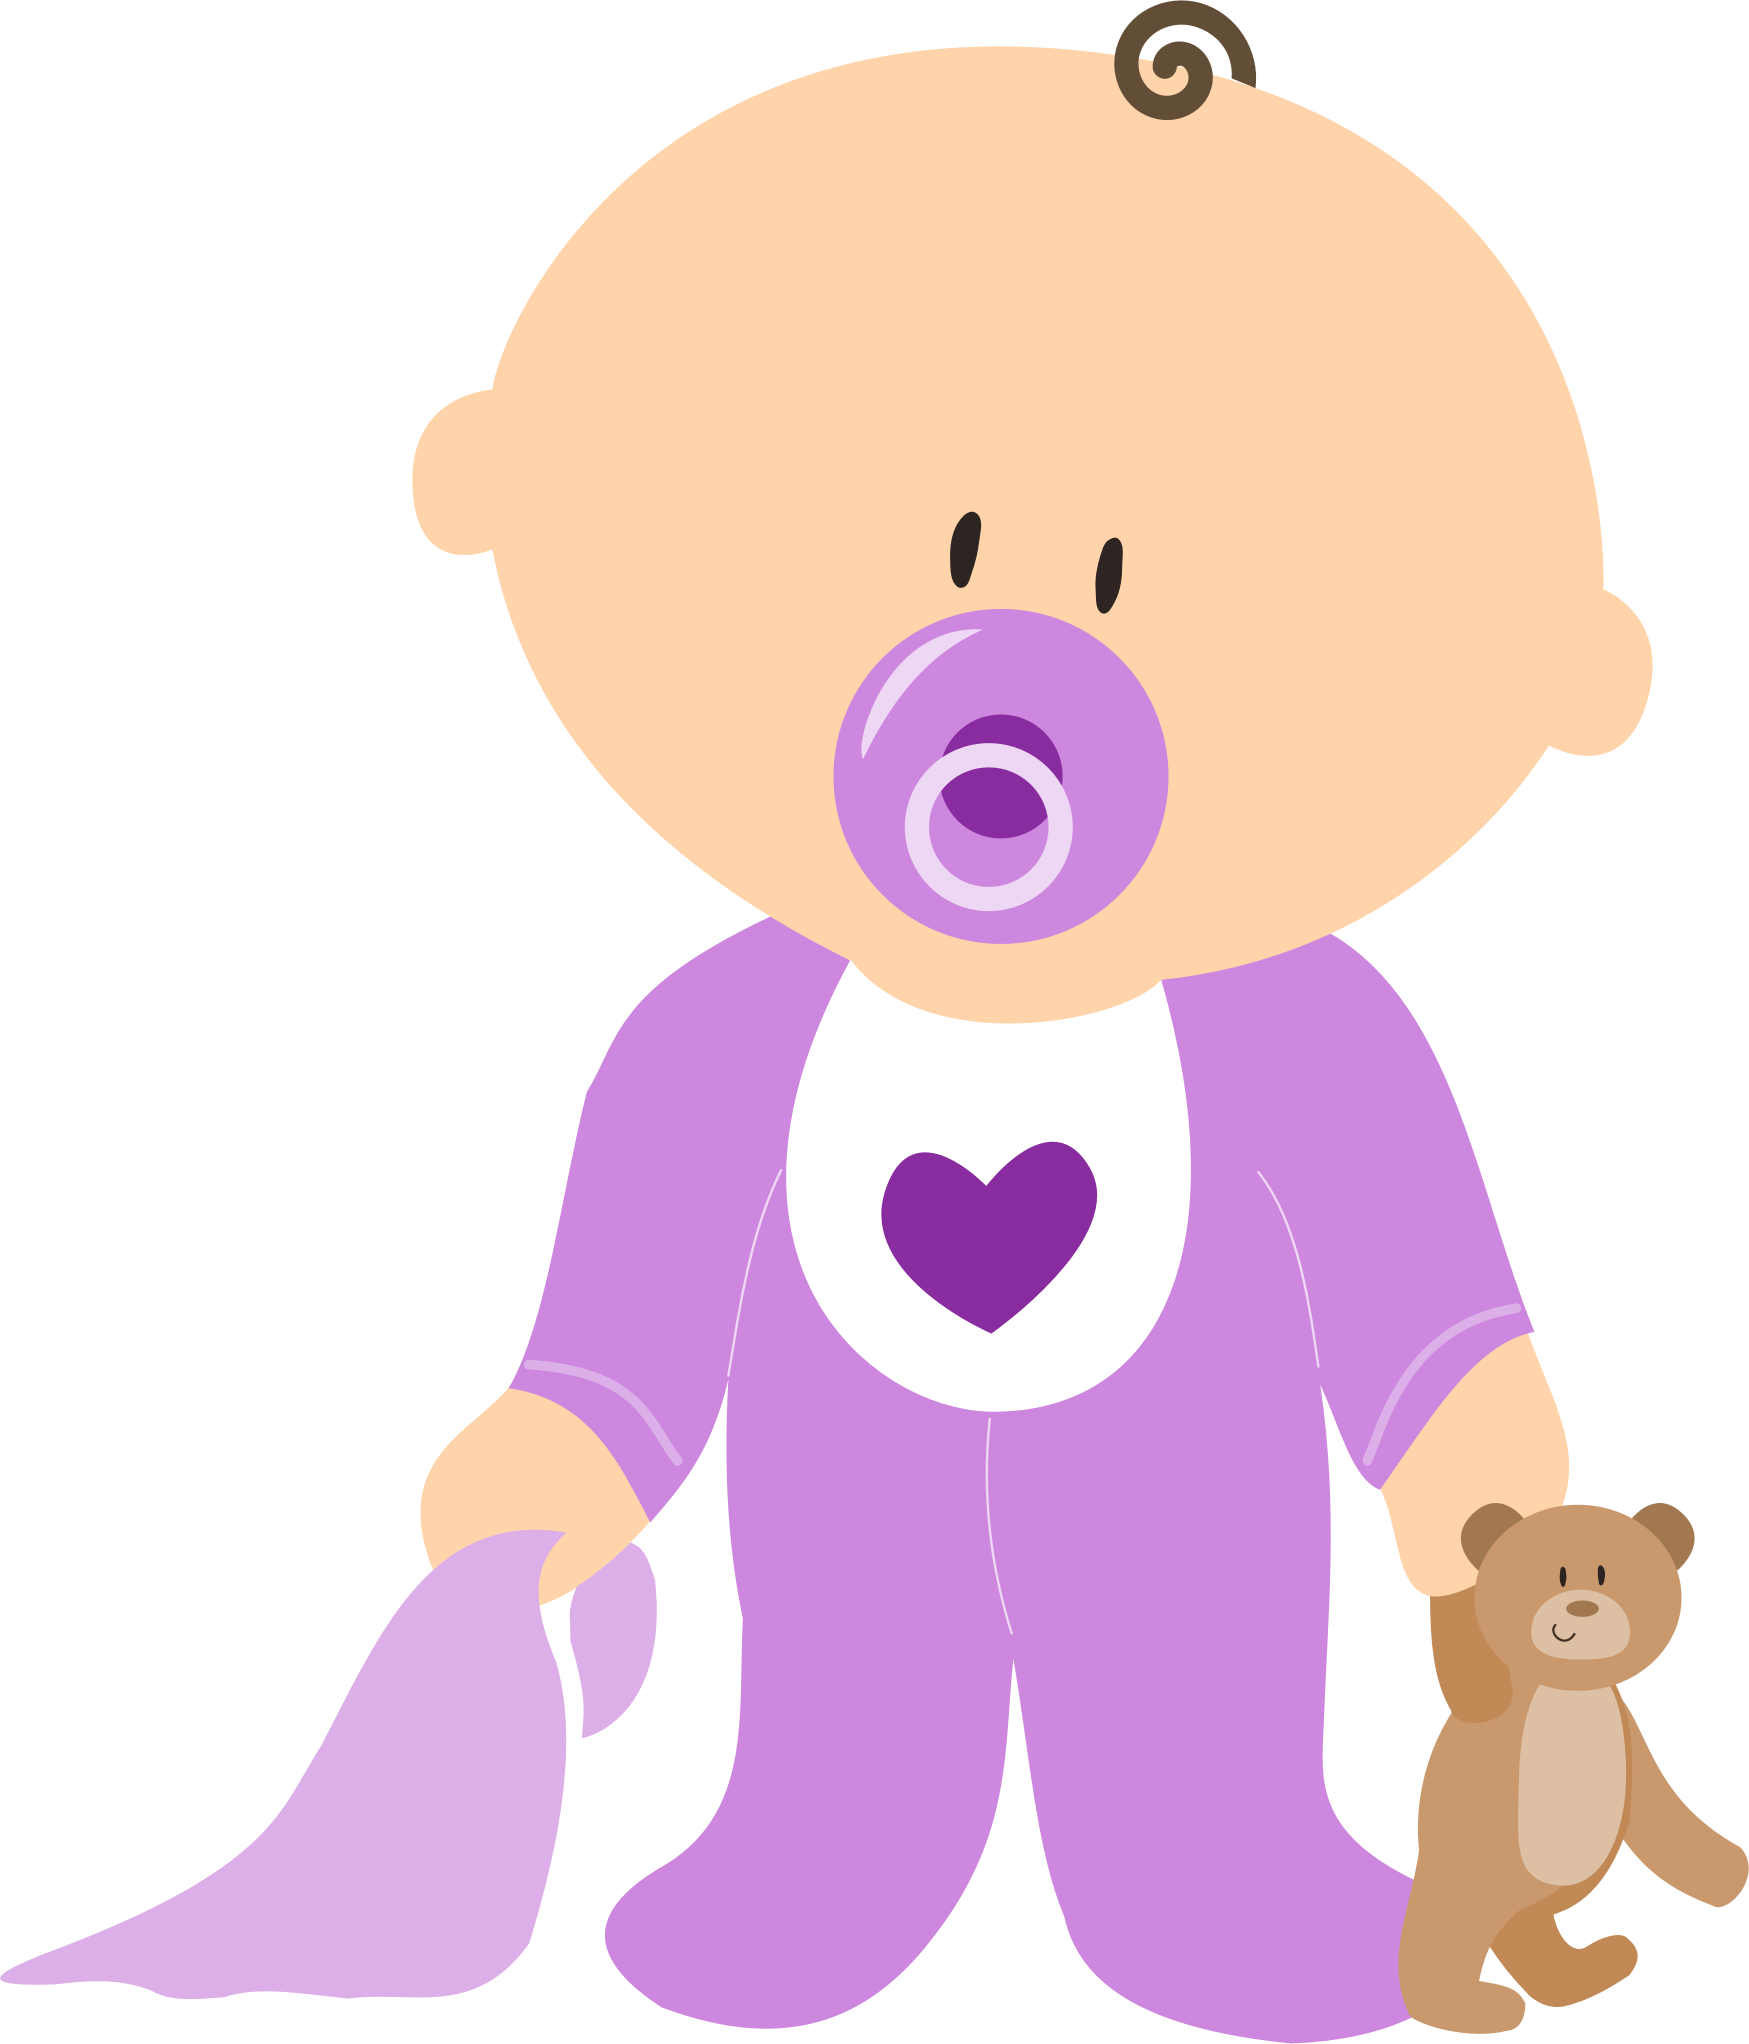 Clipart - Baby Boy